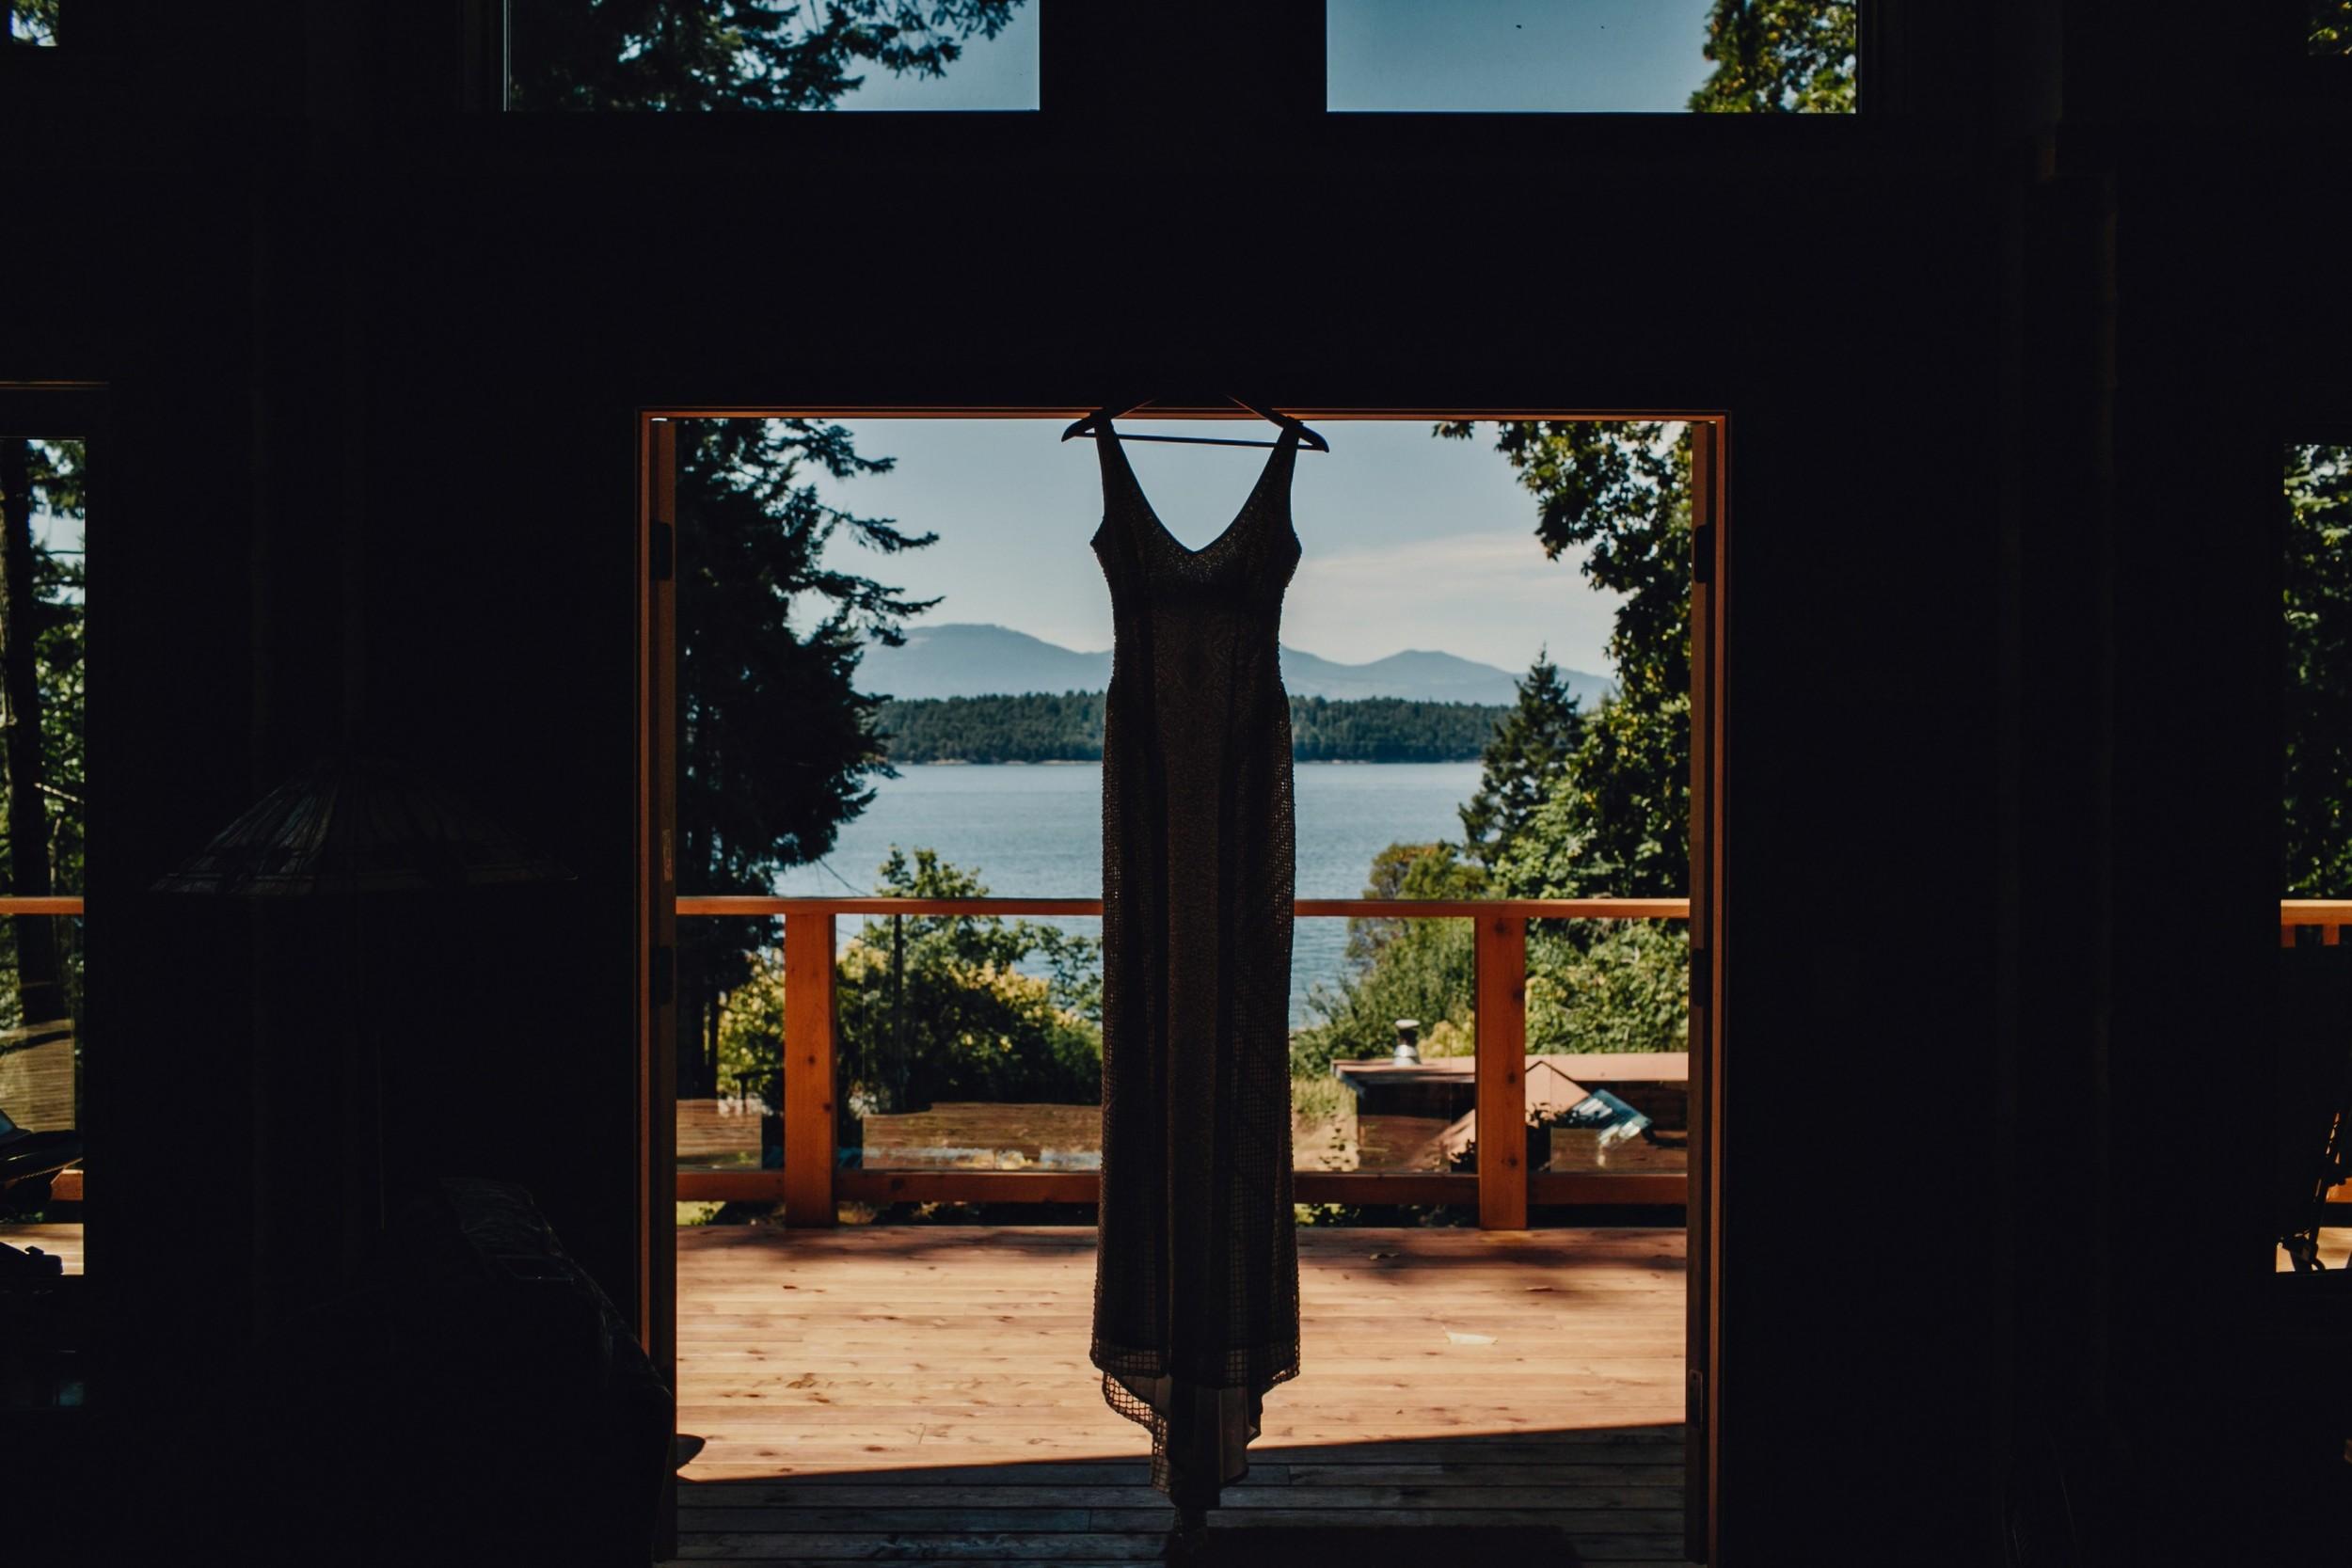 galiano-island-bodega-destination-wedding-0011.JPG